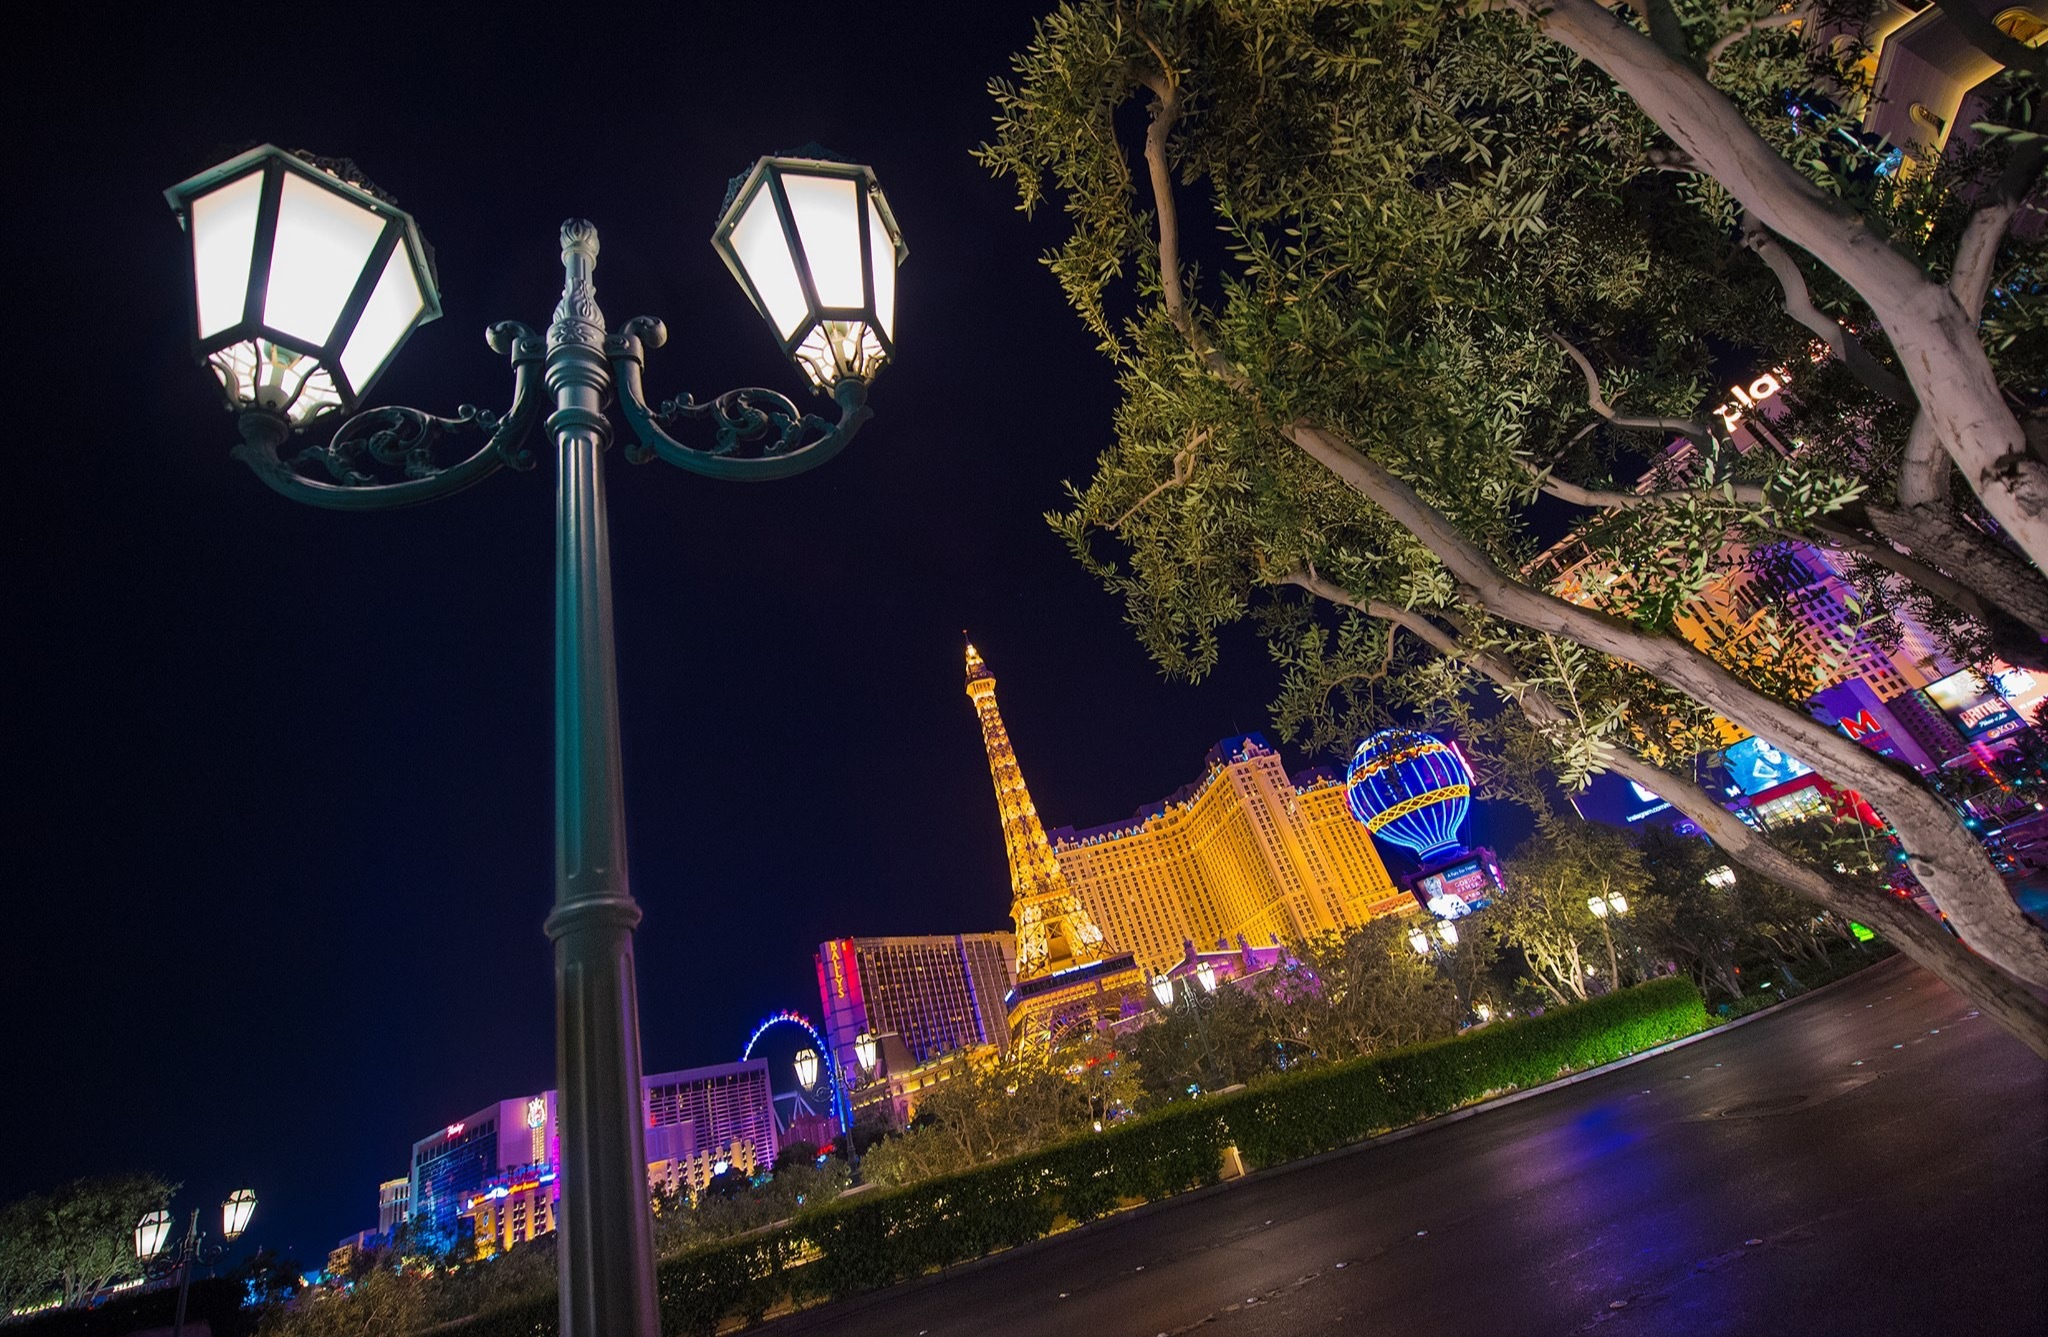 Sin City Las Vegas,Nevada  by Walter Novak